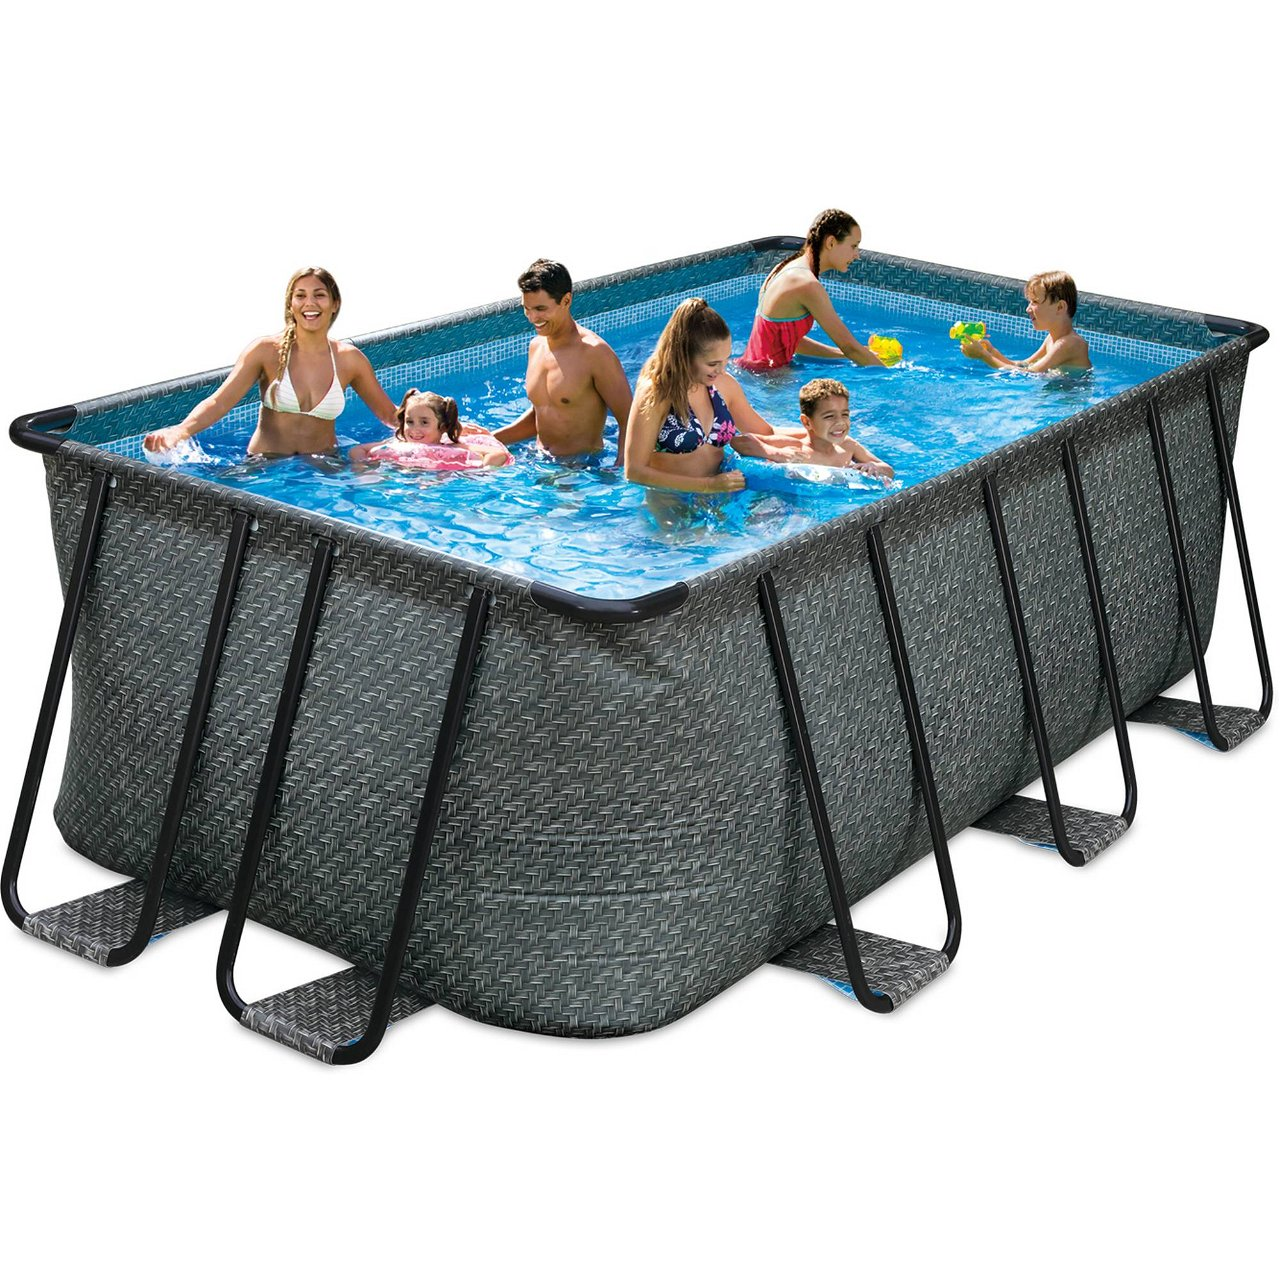 Elite Rechteck Frame Pool Set Rattan Braun 549 x 274 x 132 cm